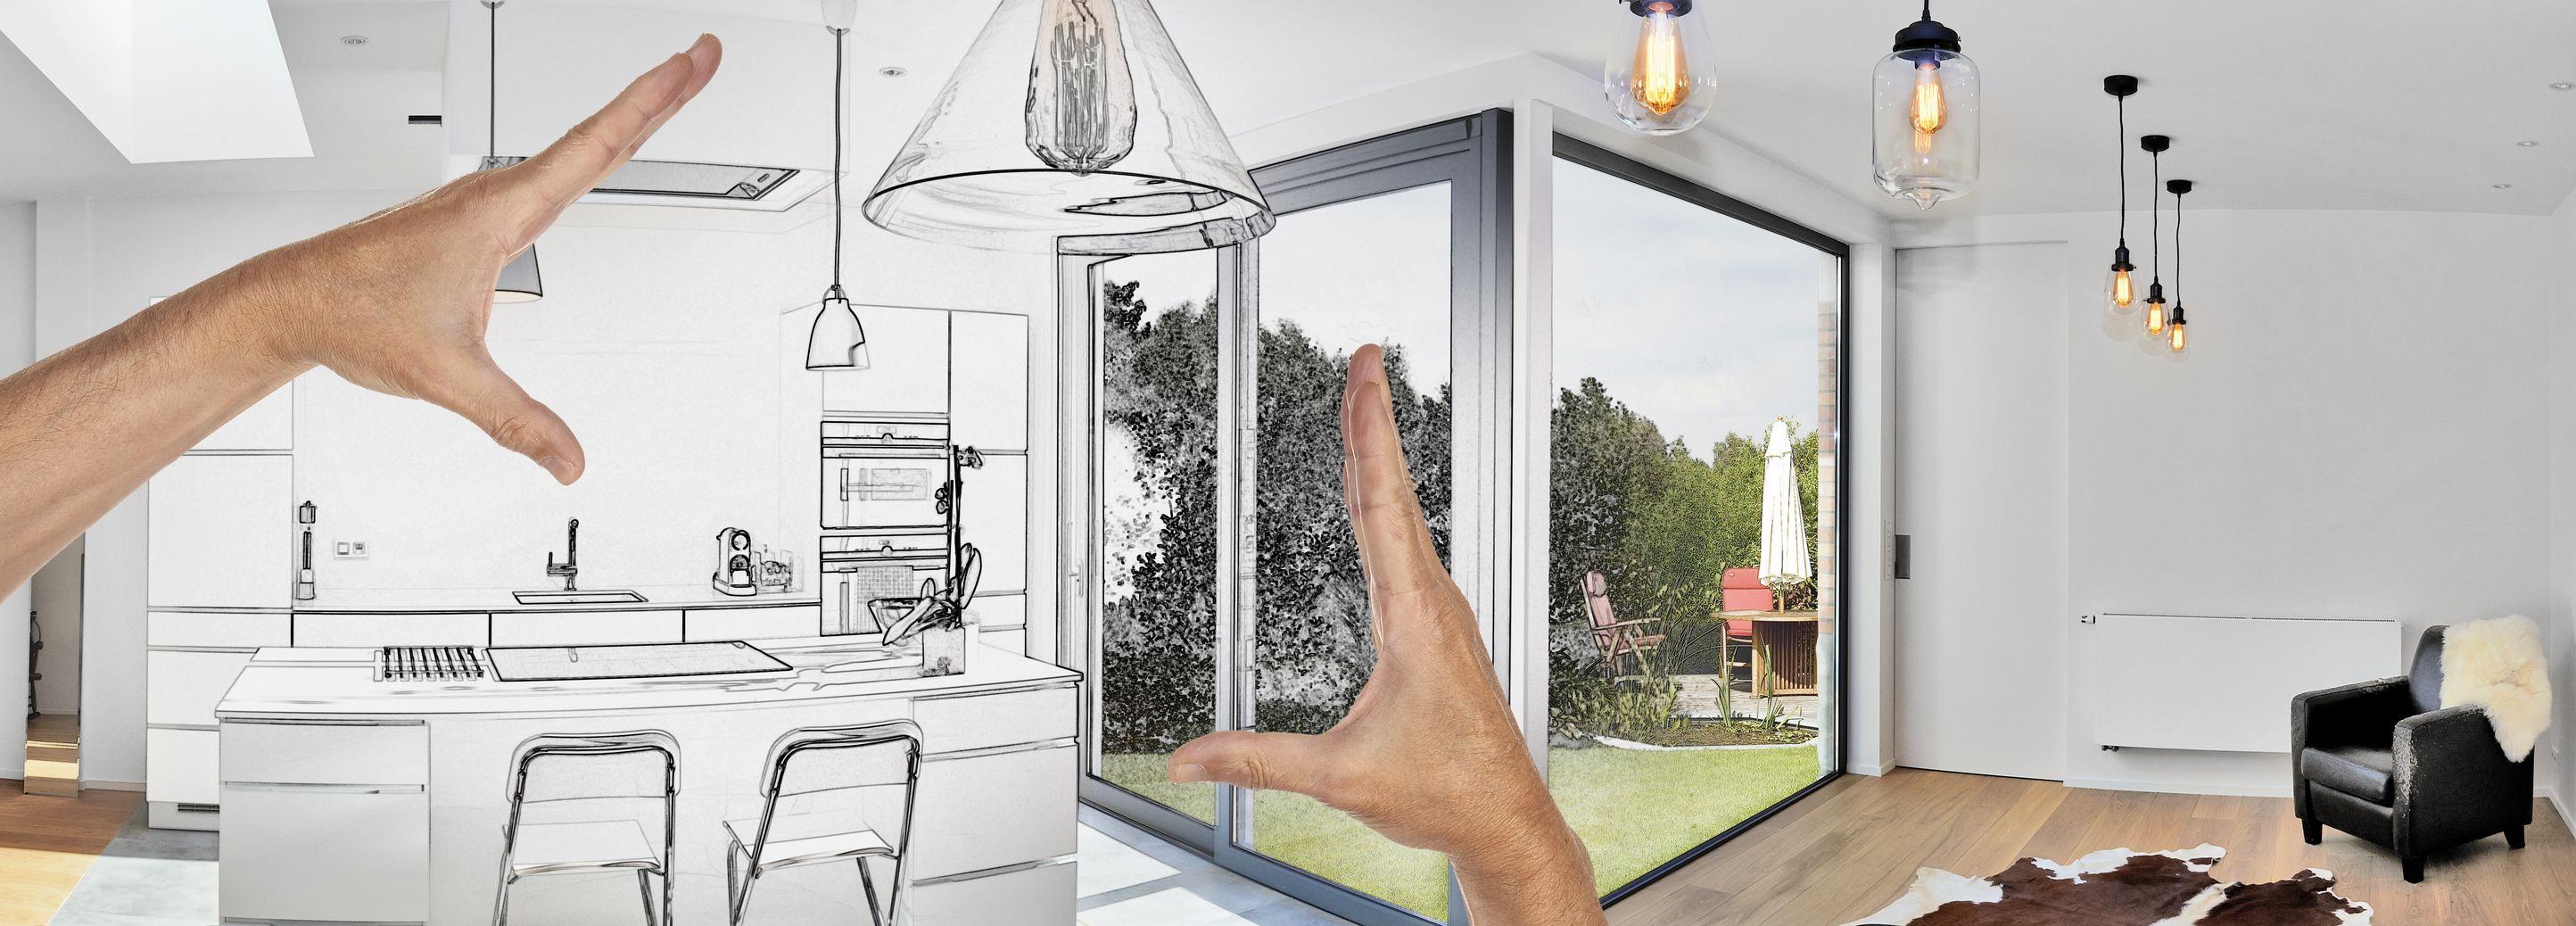 1496139322-planned-renovation-of-a-open-modern-kitchen-from-loft.jpg